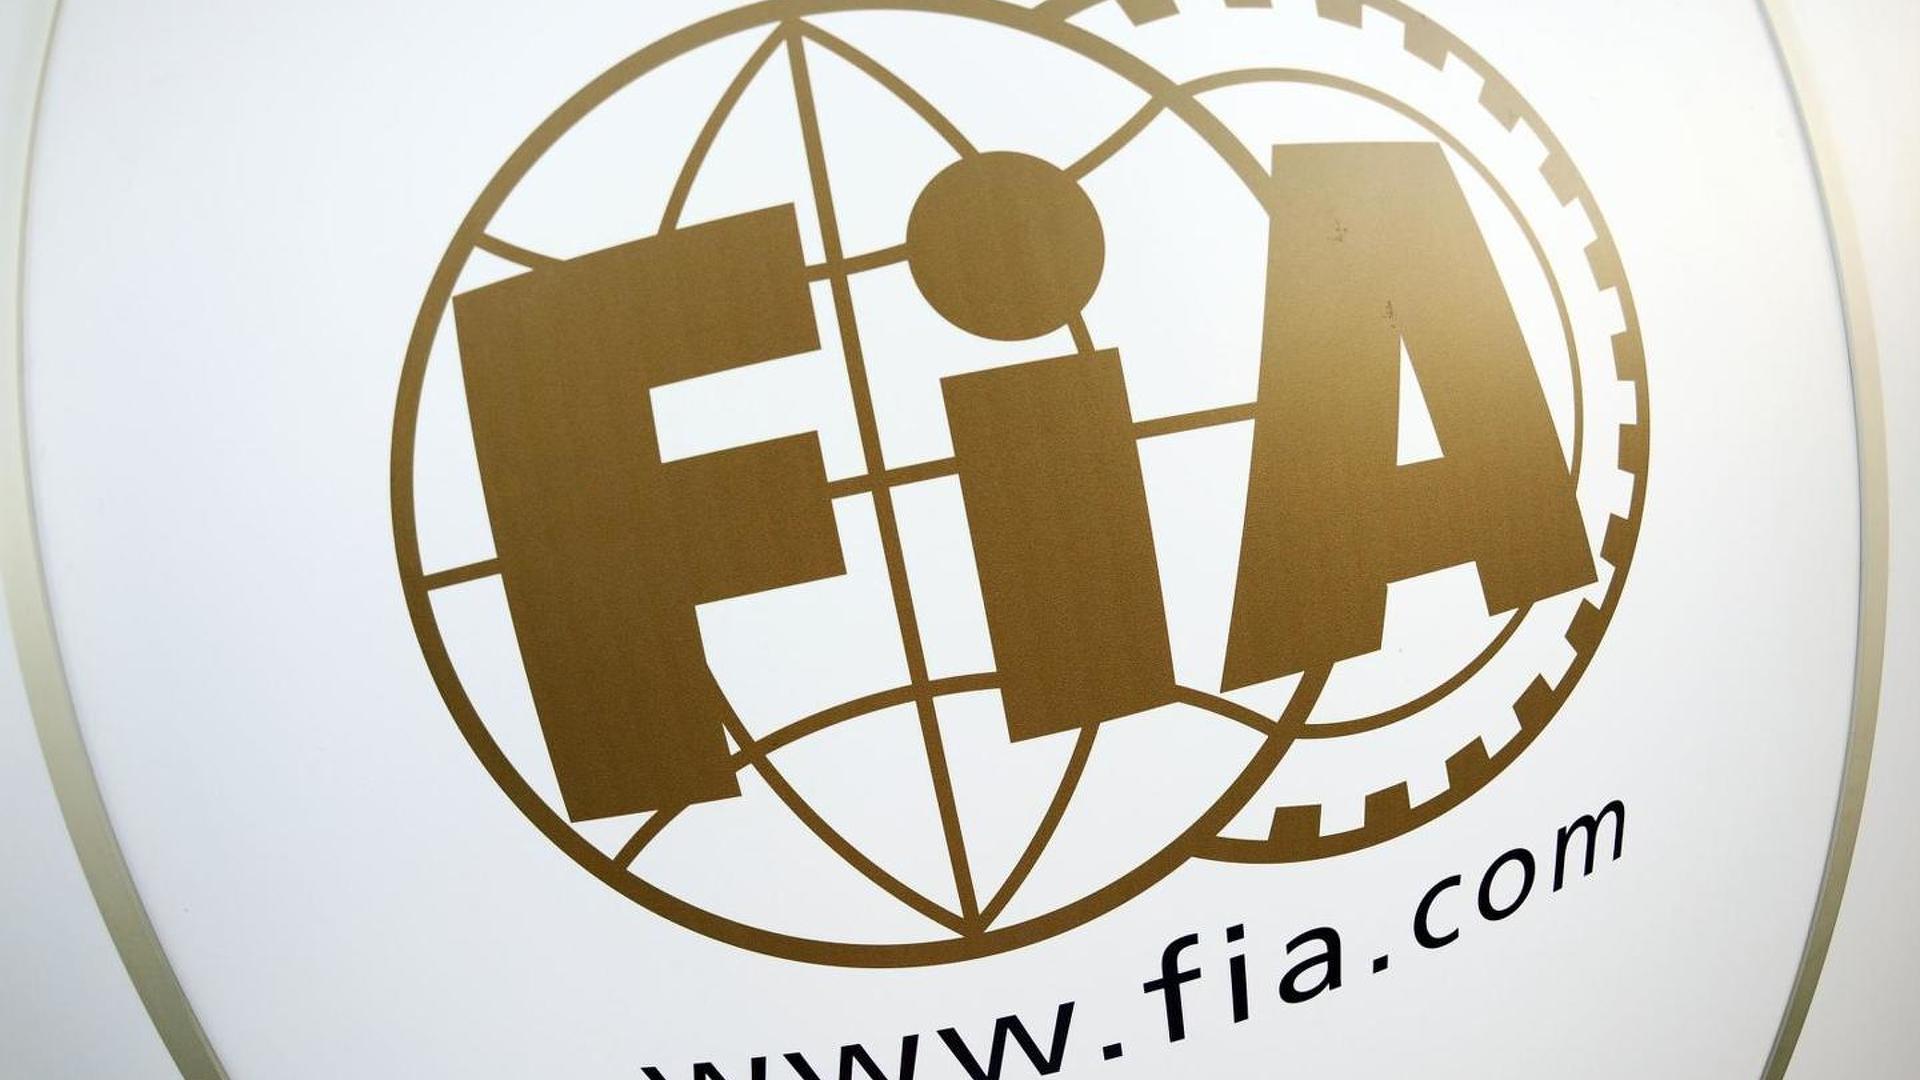 F1 management is 'blockage' for sponsors - Lopez